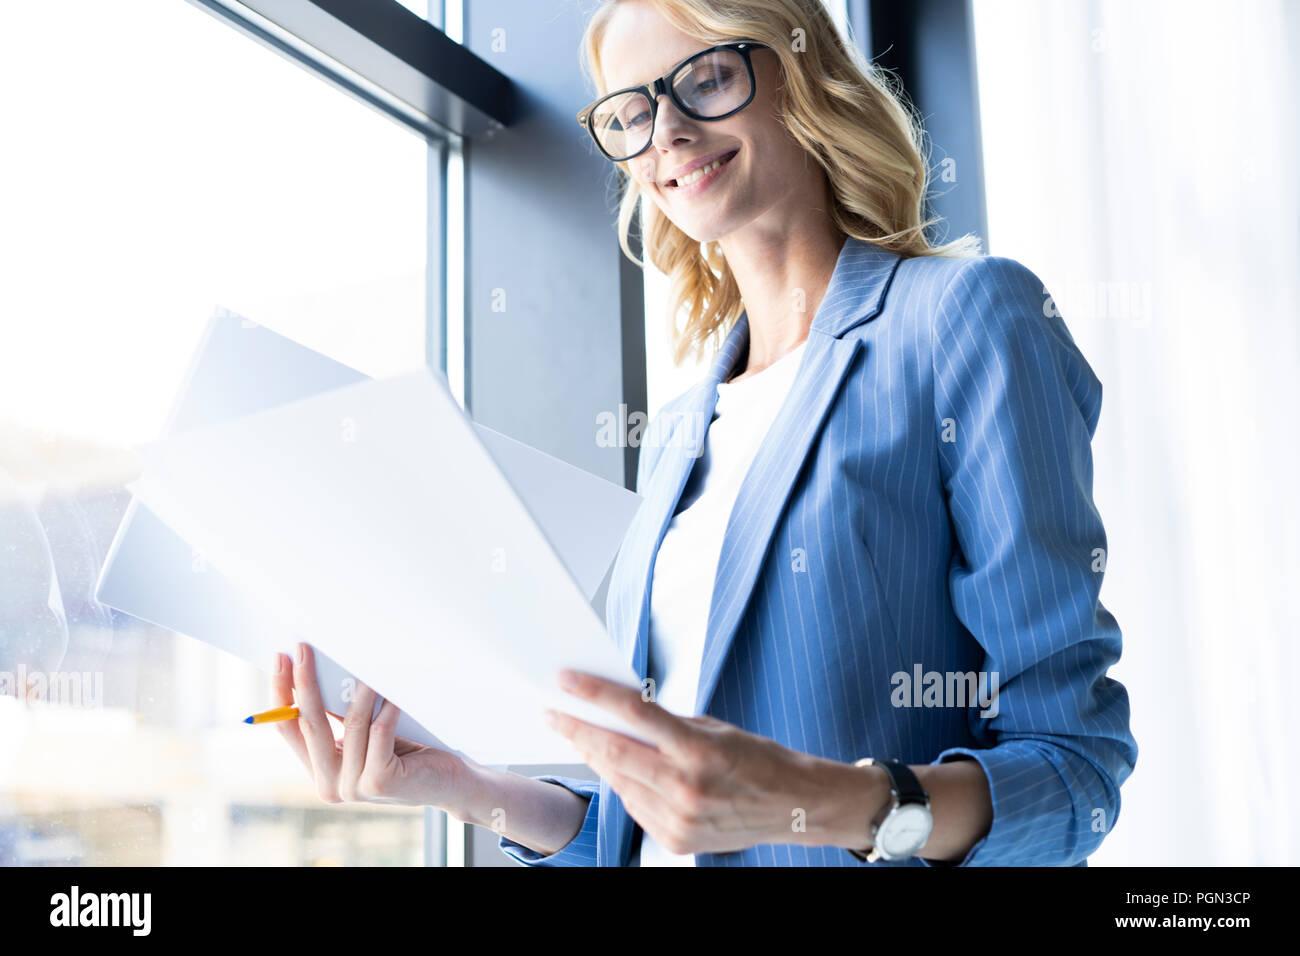 Moderne Business-Frau im Büro mit Textfreiraum. Stockfoto